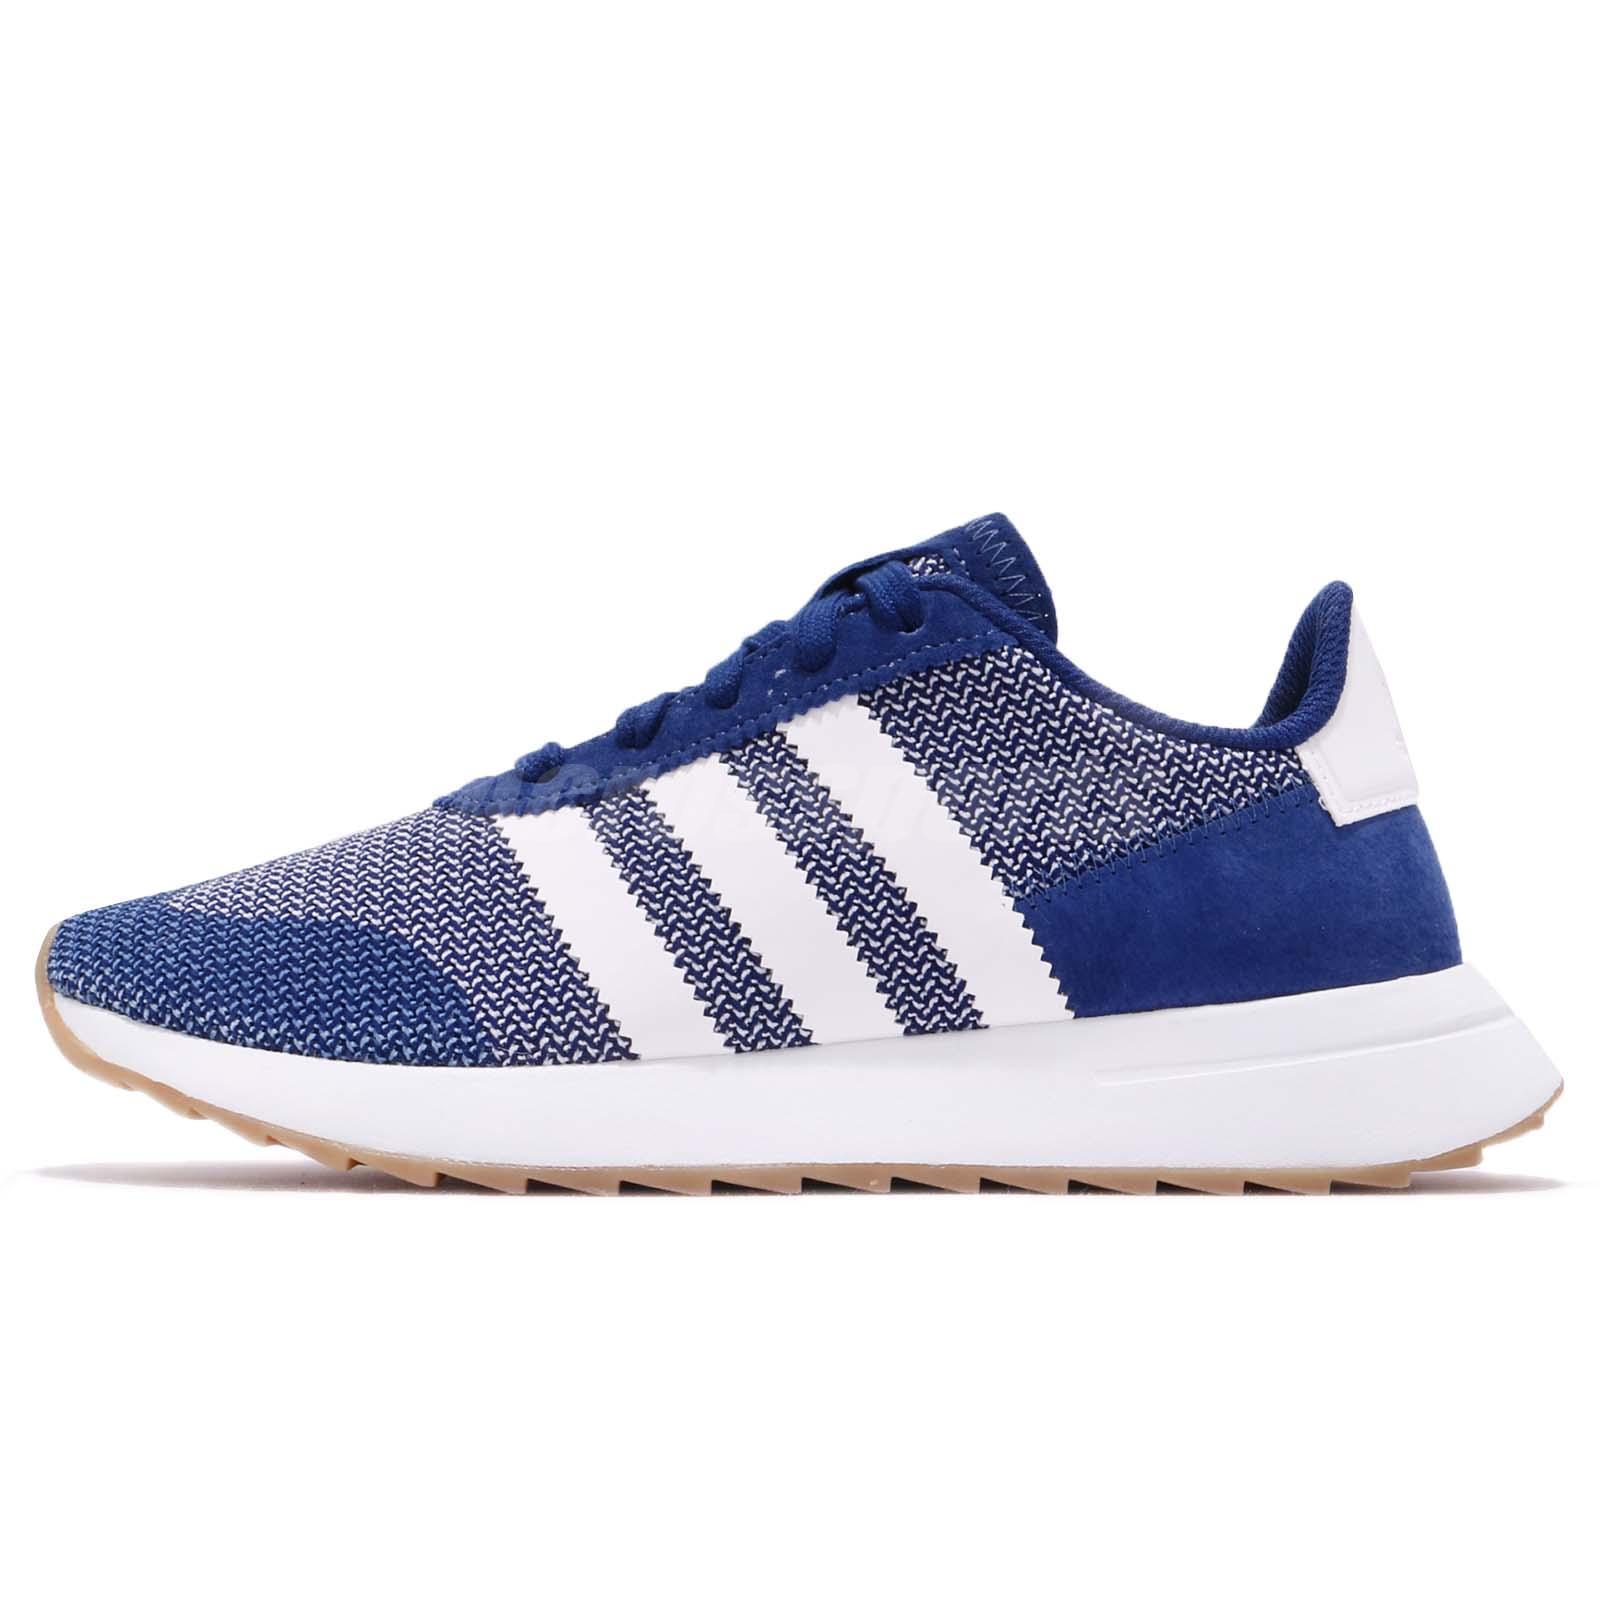 premium selection 6bc8d 157ac adidas Originals FLB Runner W Blue White Gum Women Running Shoes Sneakers  DB2117